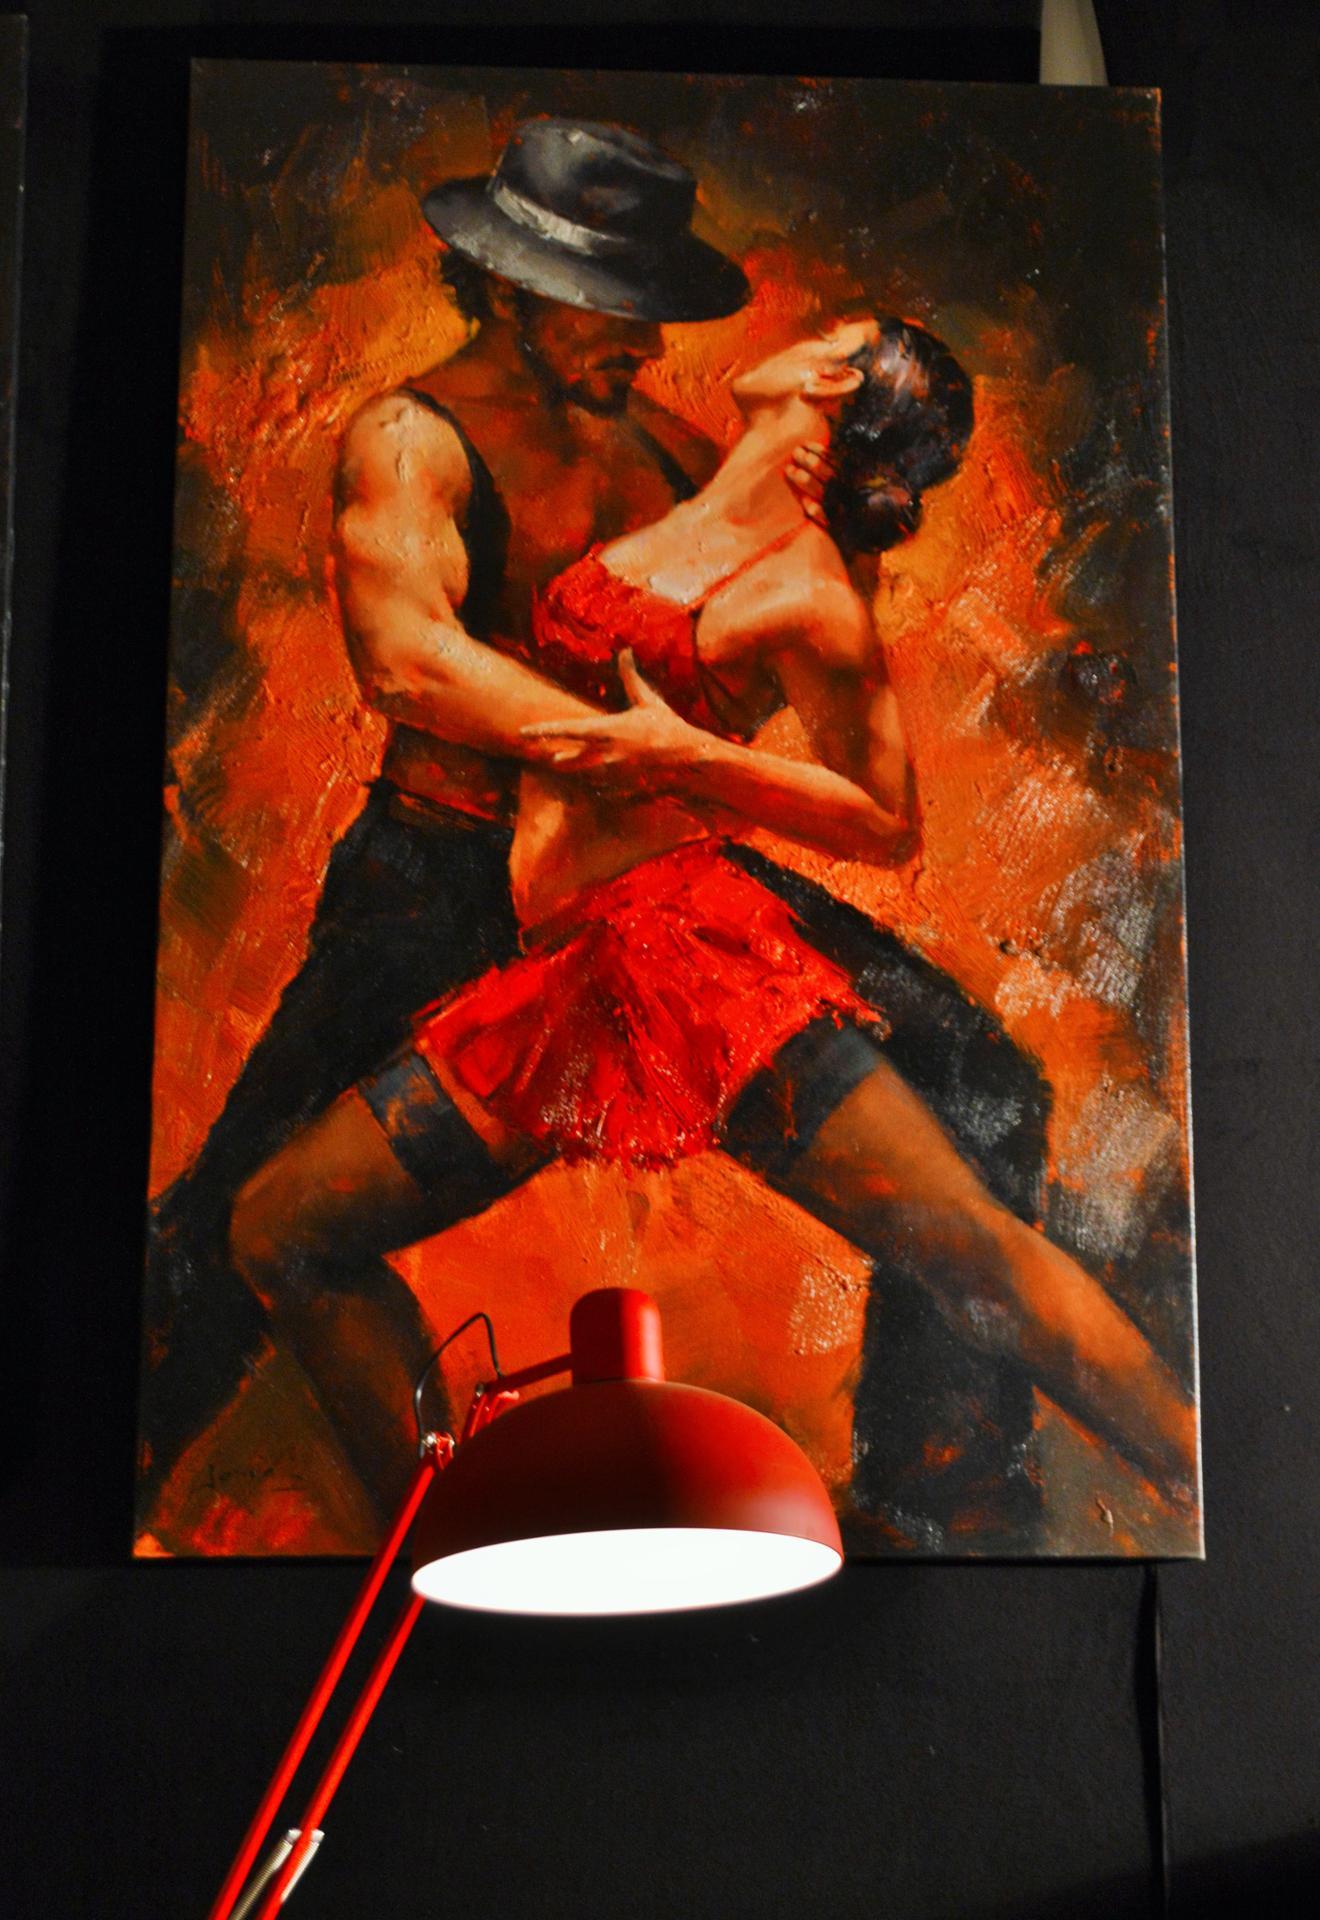 tango chat pas loupé